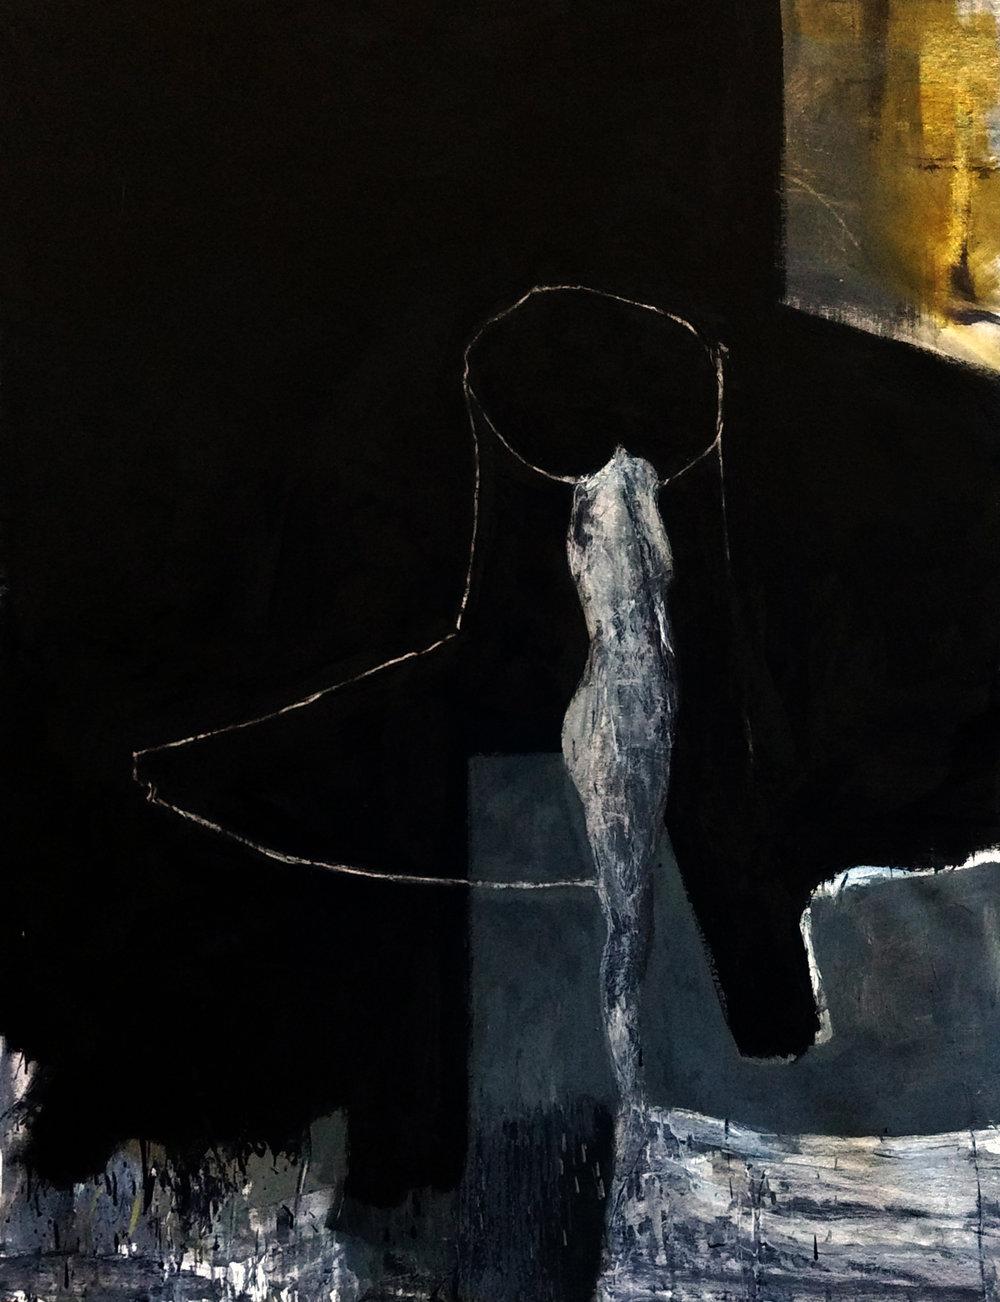 Maniquí de mujer,  2016  Óleo sobre lienzo  130 x 100 cm